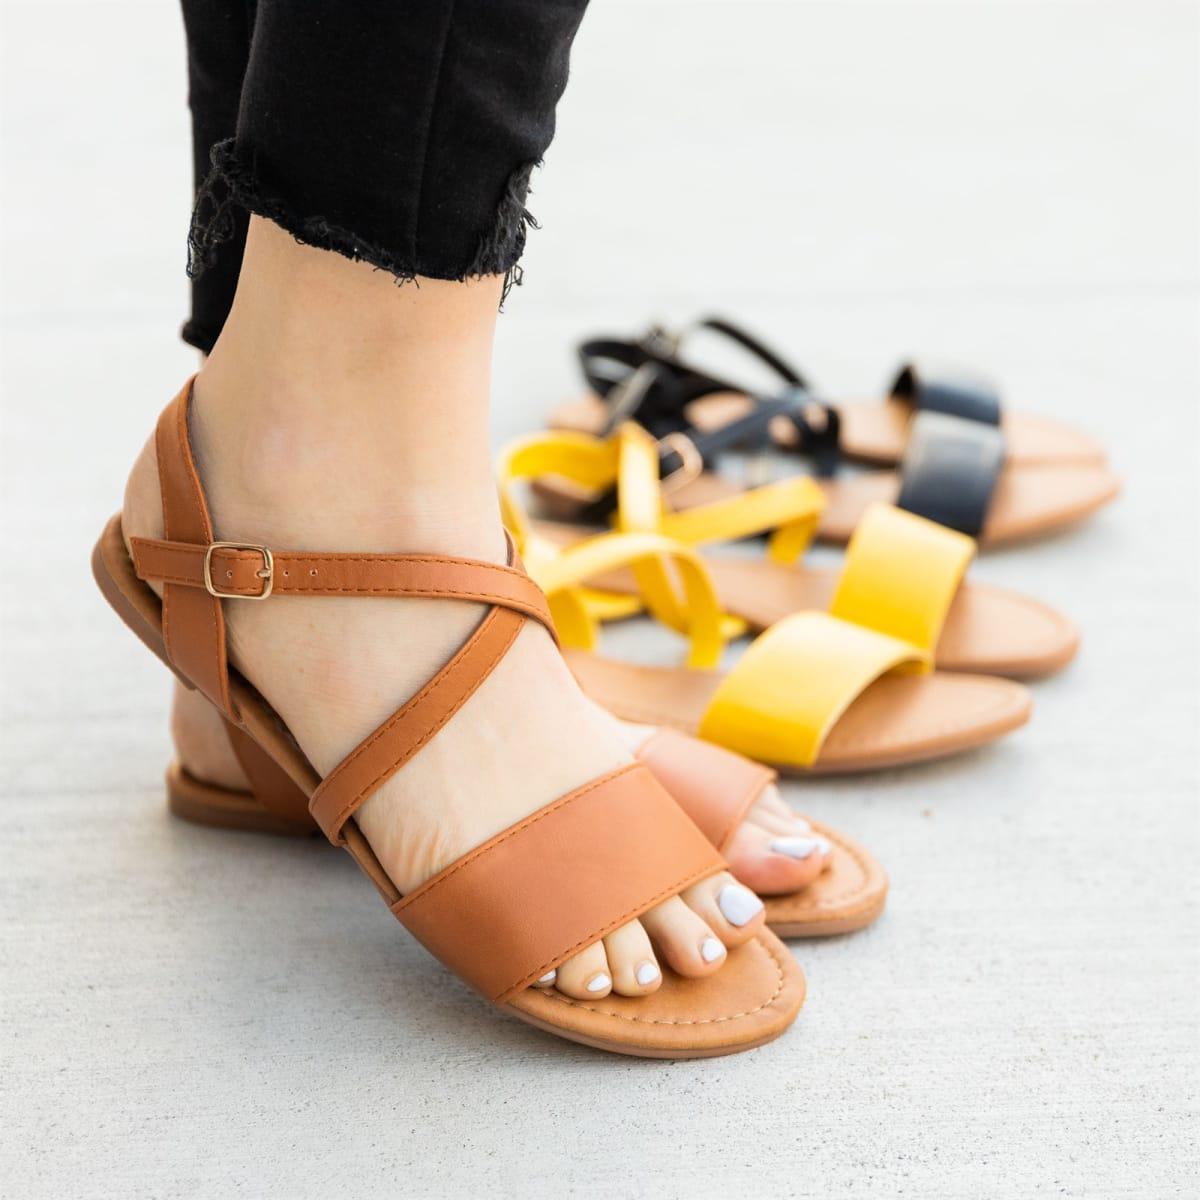 Chic Criss Cross Strap Sandals